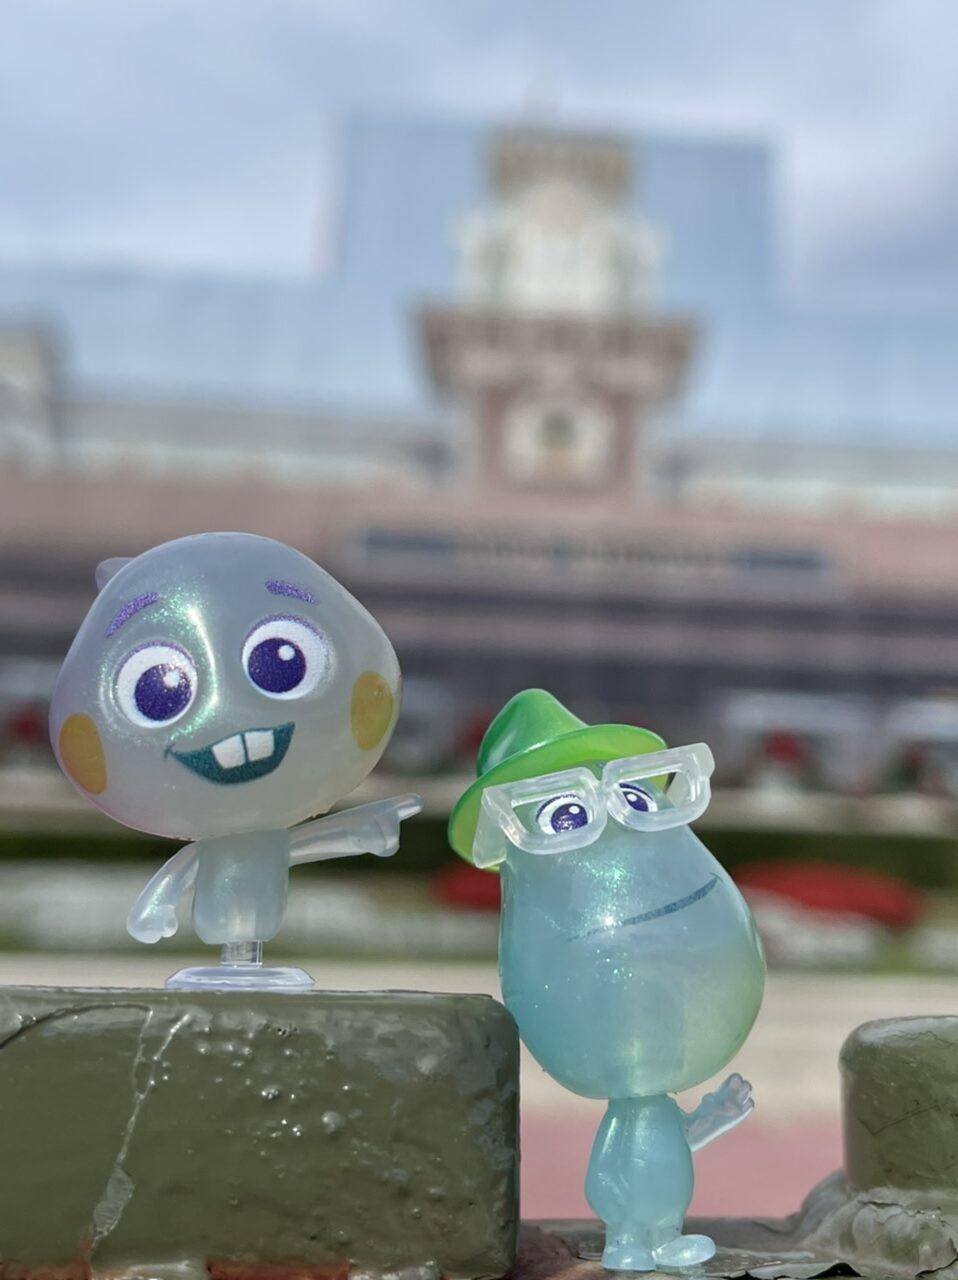 Disney Soul toy characters at Magic Kingdom